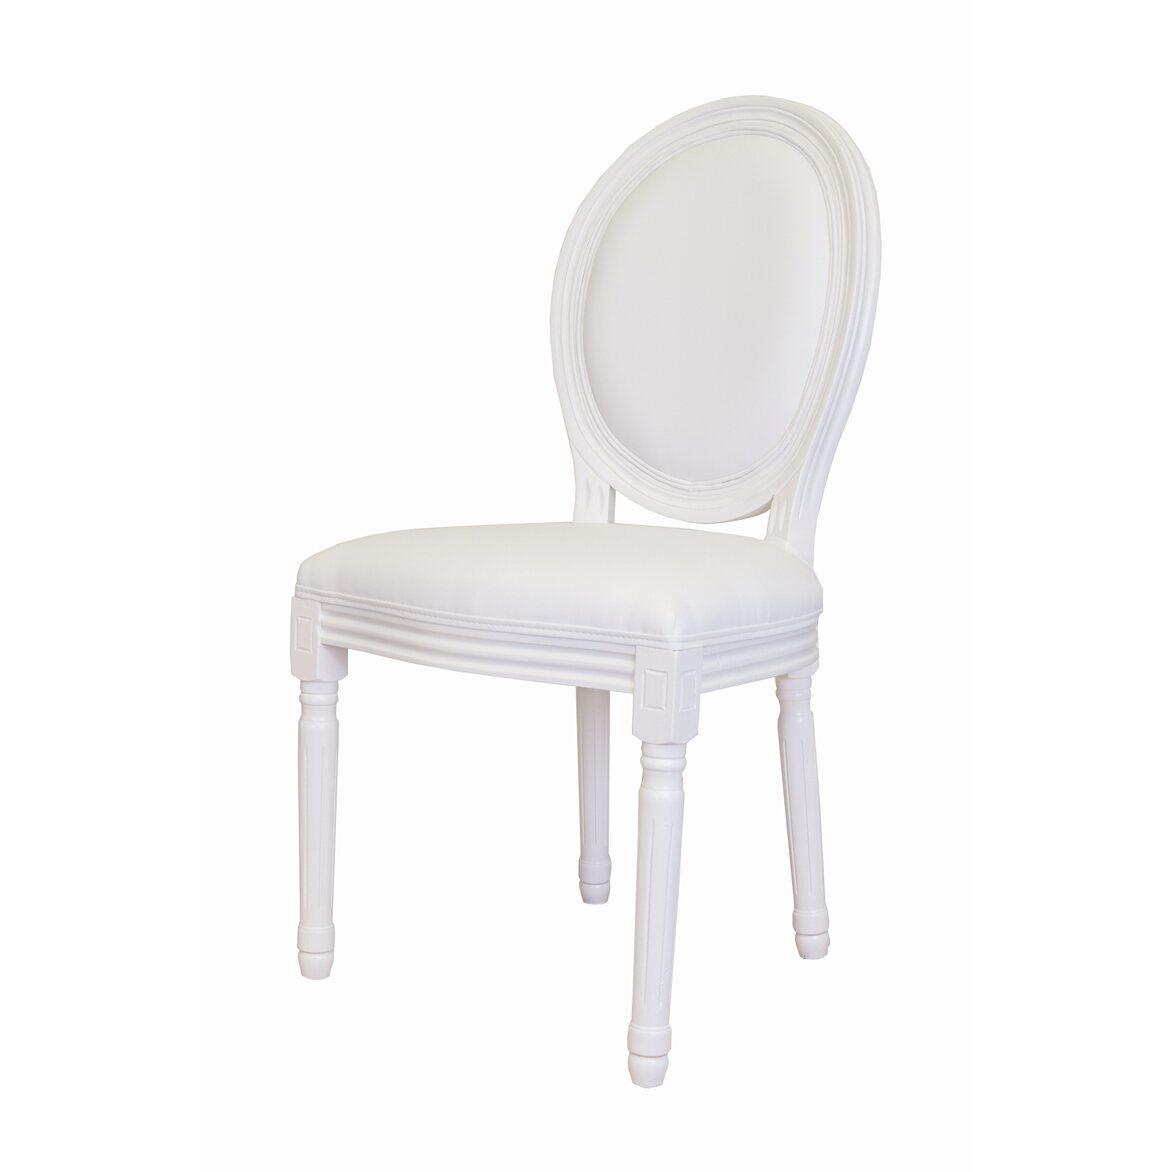 Стул Volker white 4   Обеденные стулья Kingsby